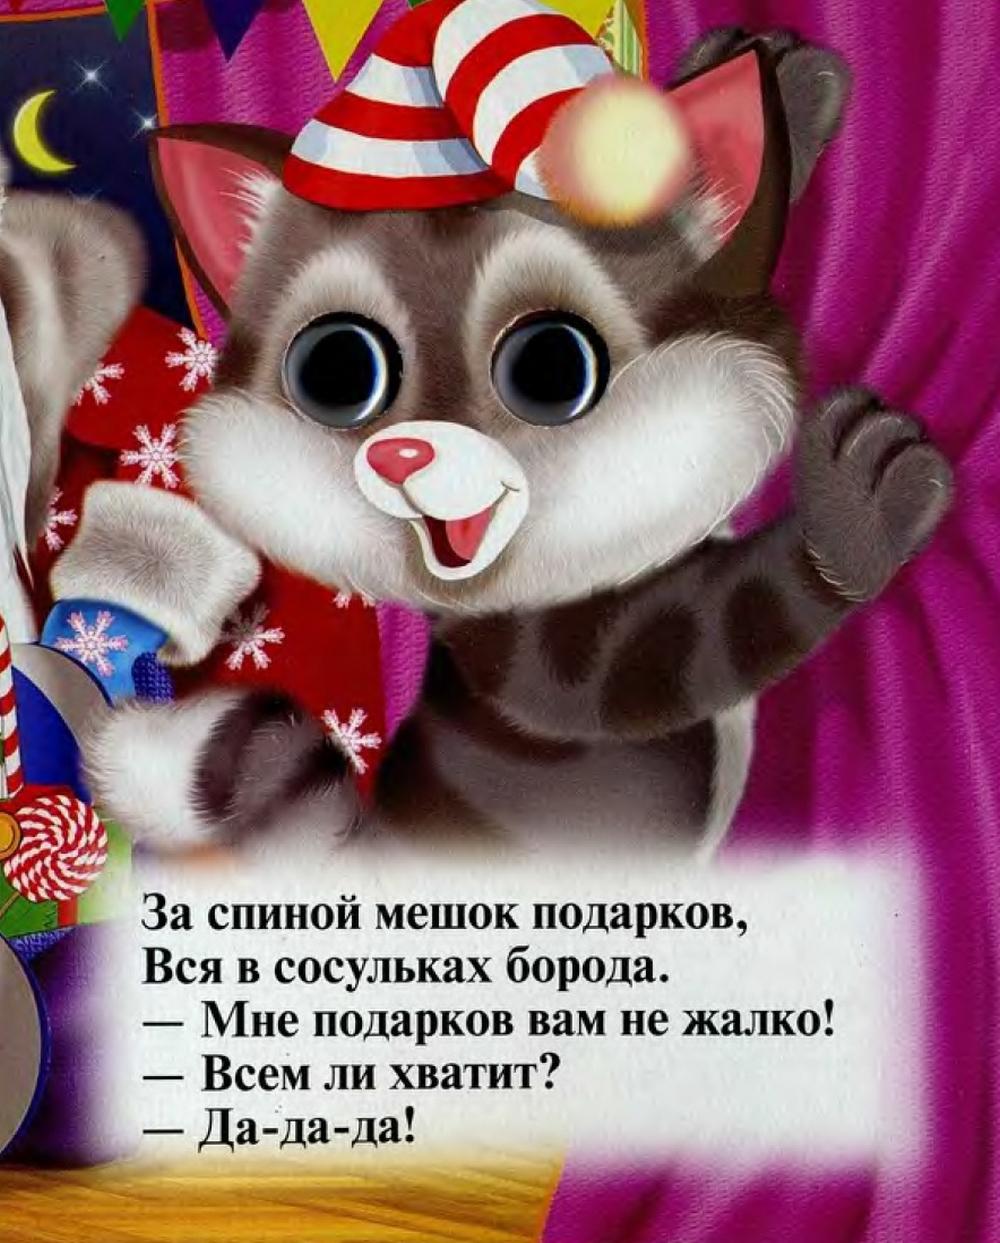 http://i6.imageban.ru/out/2013/11/25/b804c6019a4bbd0e60e0436df6cb7aee.jpg